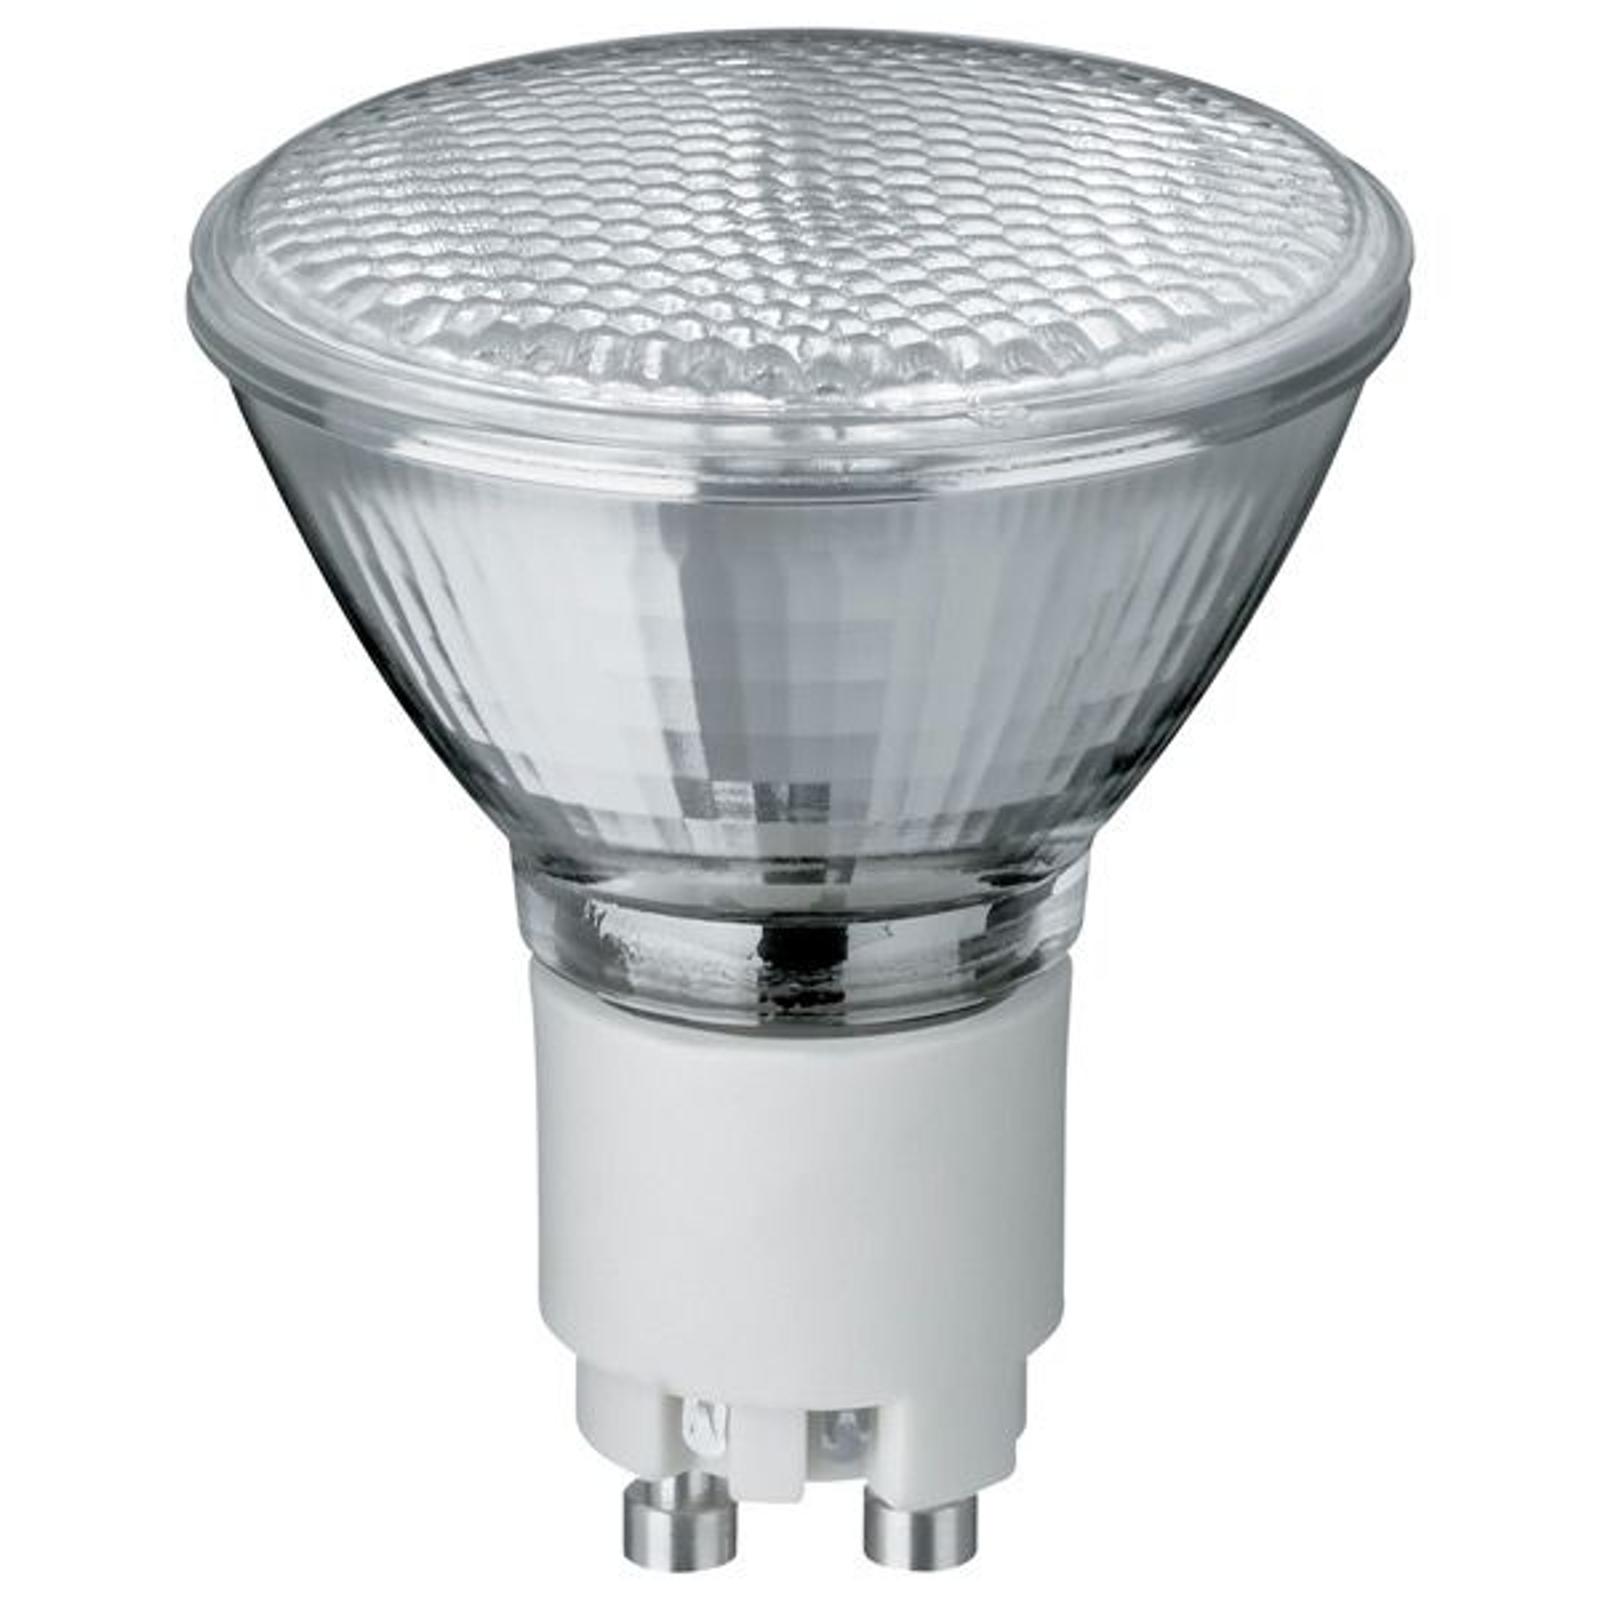 GX10 20W 25° Entladungslampe Mastercolor CDM-R